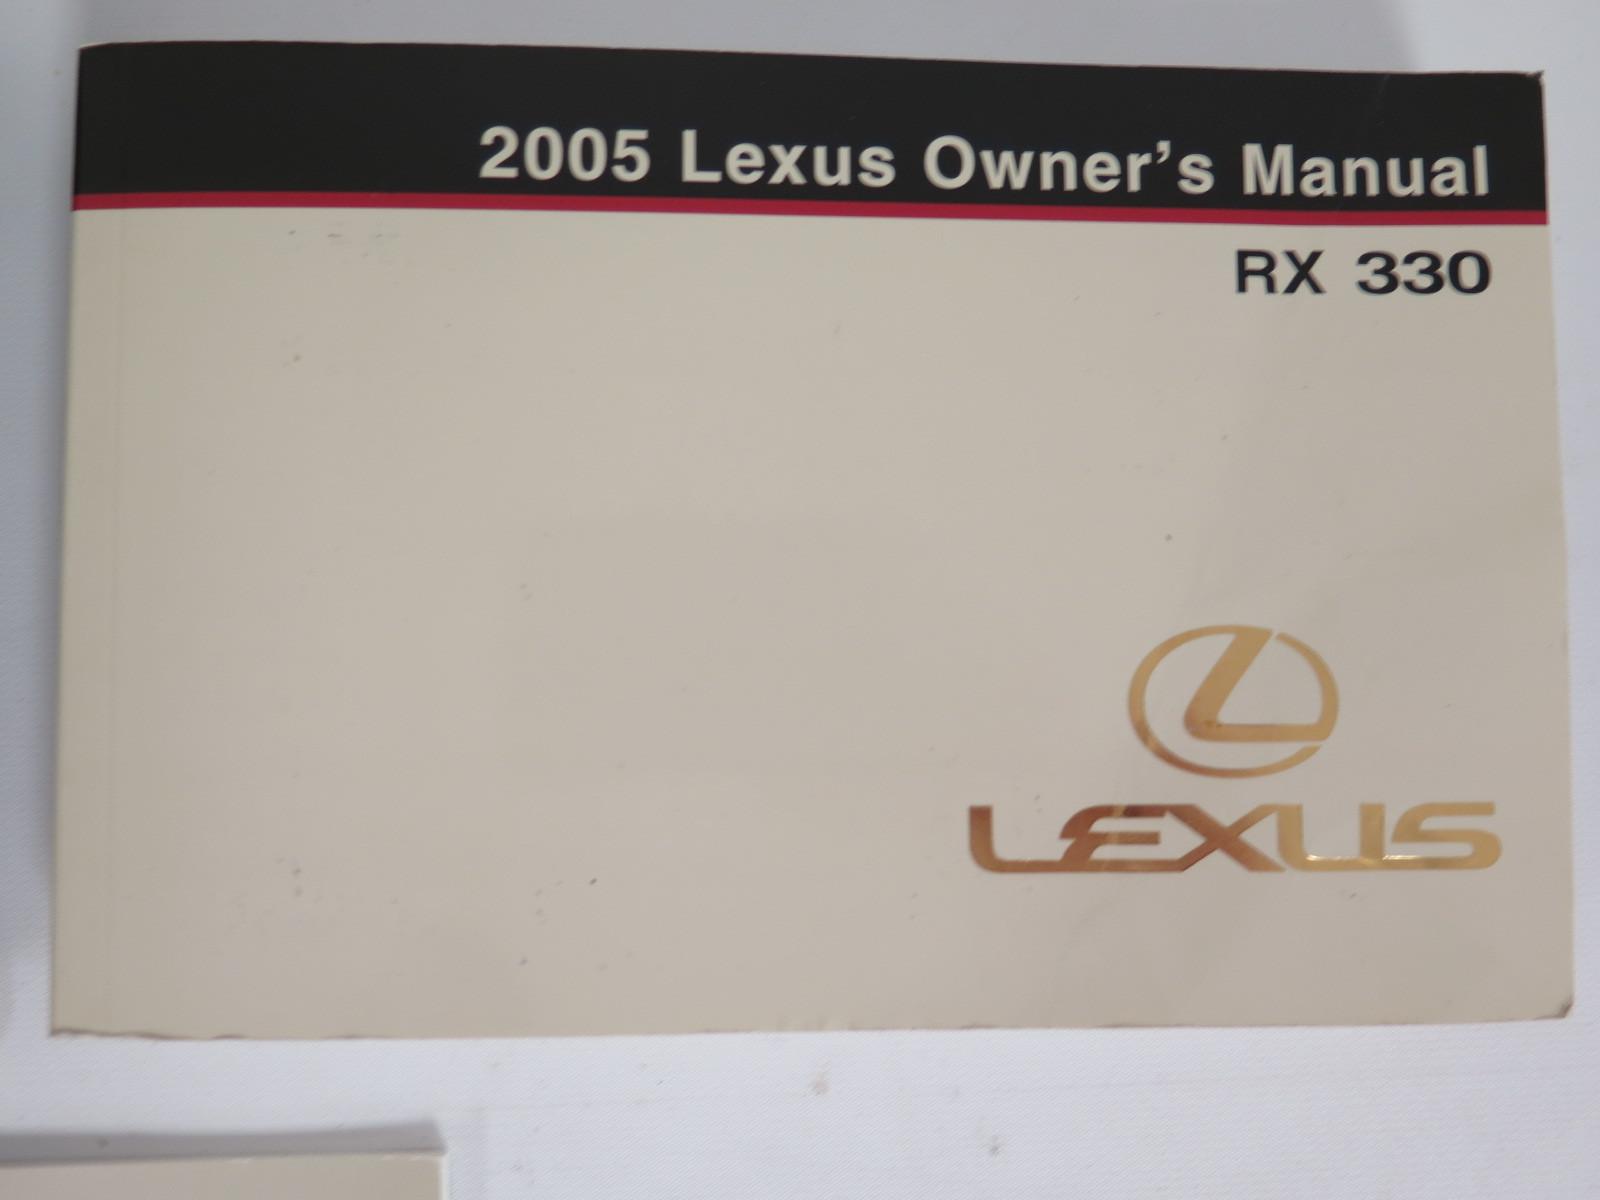 2005 lexus rx 330 owners manual book bashful yak rh bashfulyak com 2005 lexus rx330 owners manual pdf 2005 lexus es 330 owners manual pdf